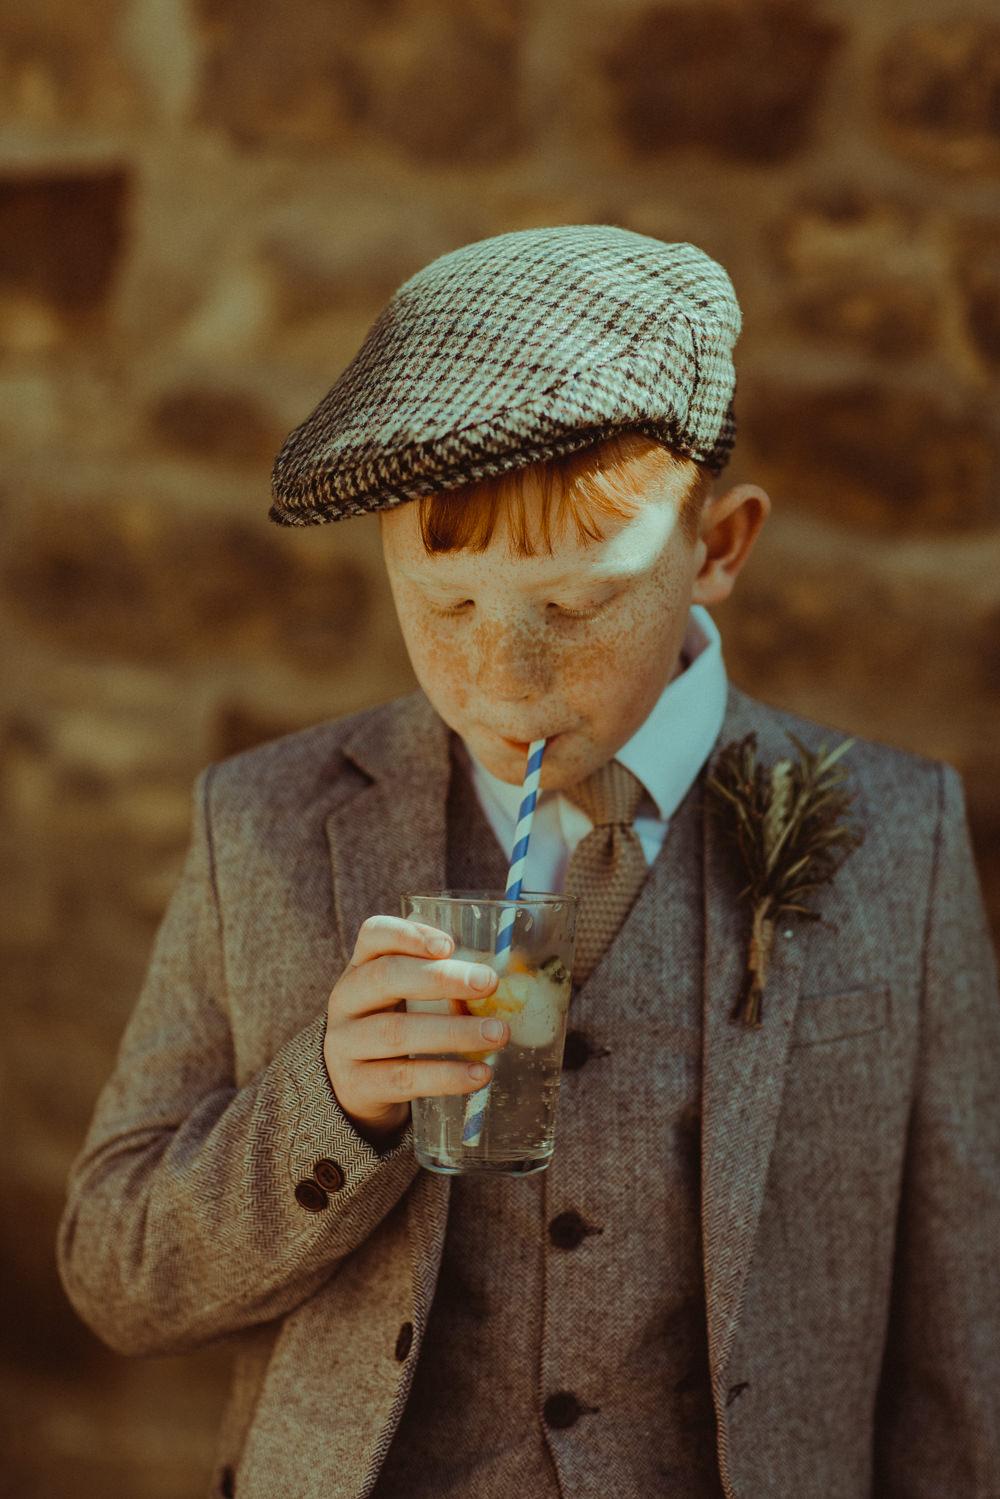 Page Boy Tweed Suit Ties Flat Cap Hat Northside Farm Wedding Belle Art Photography